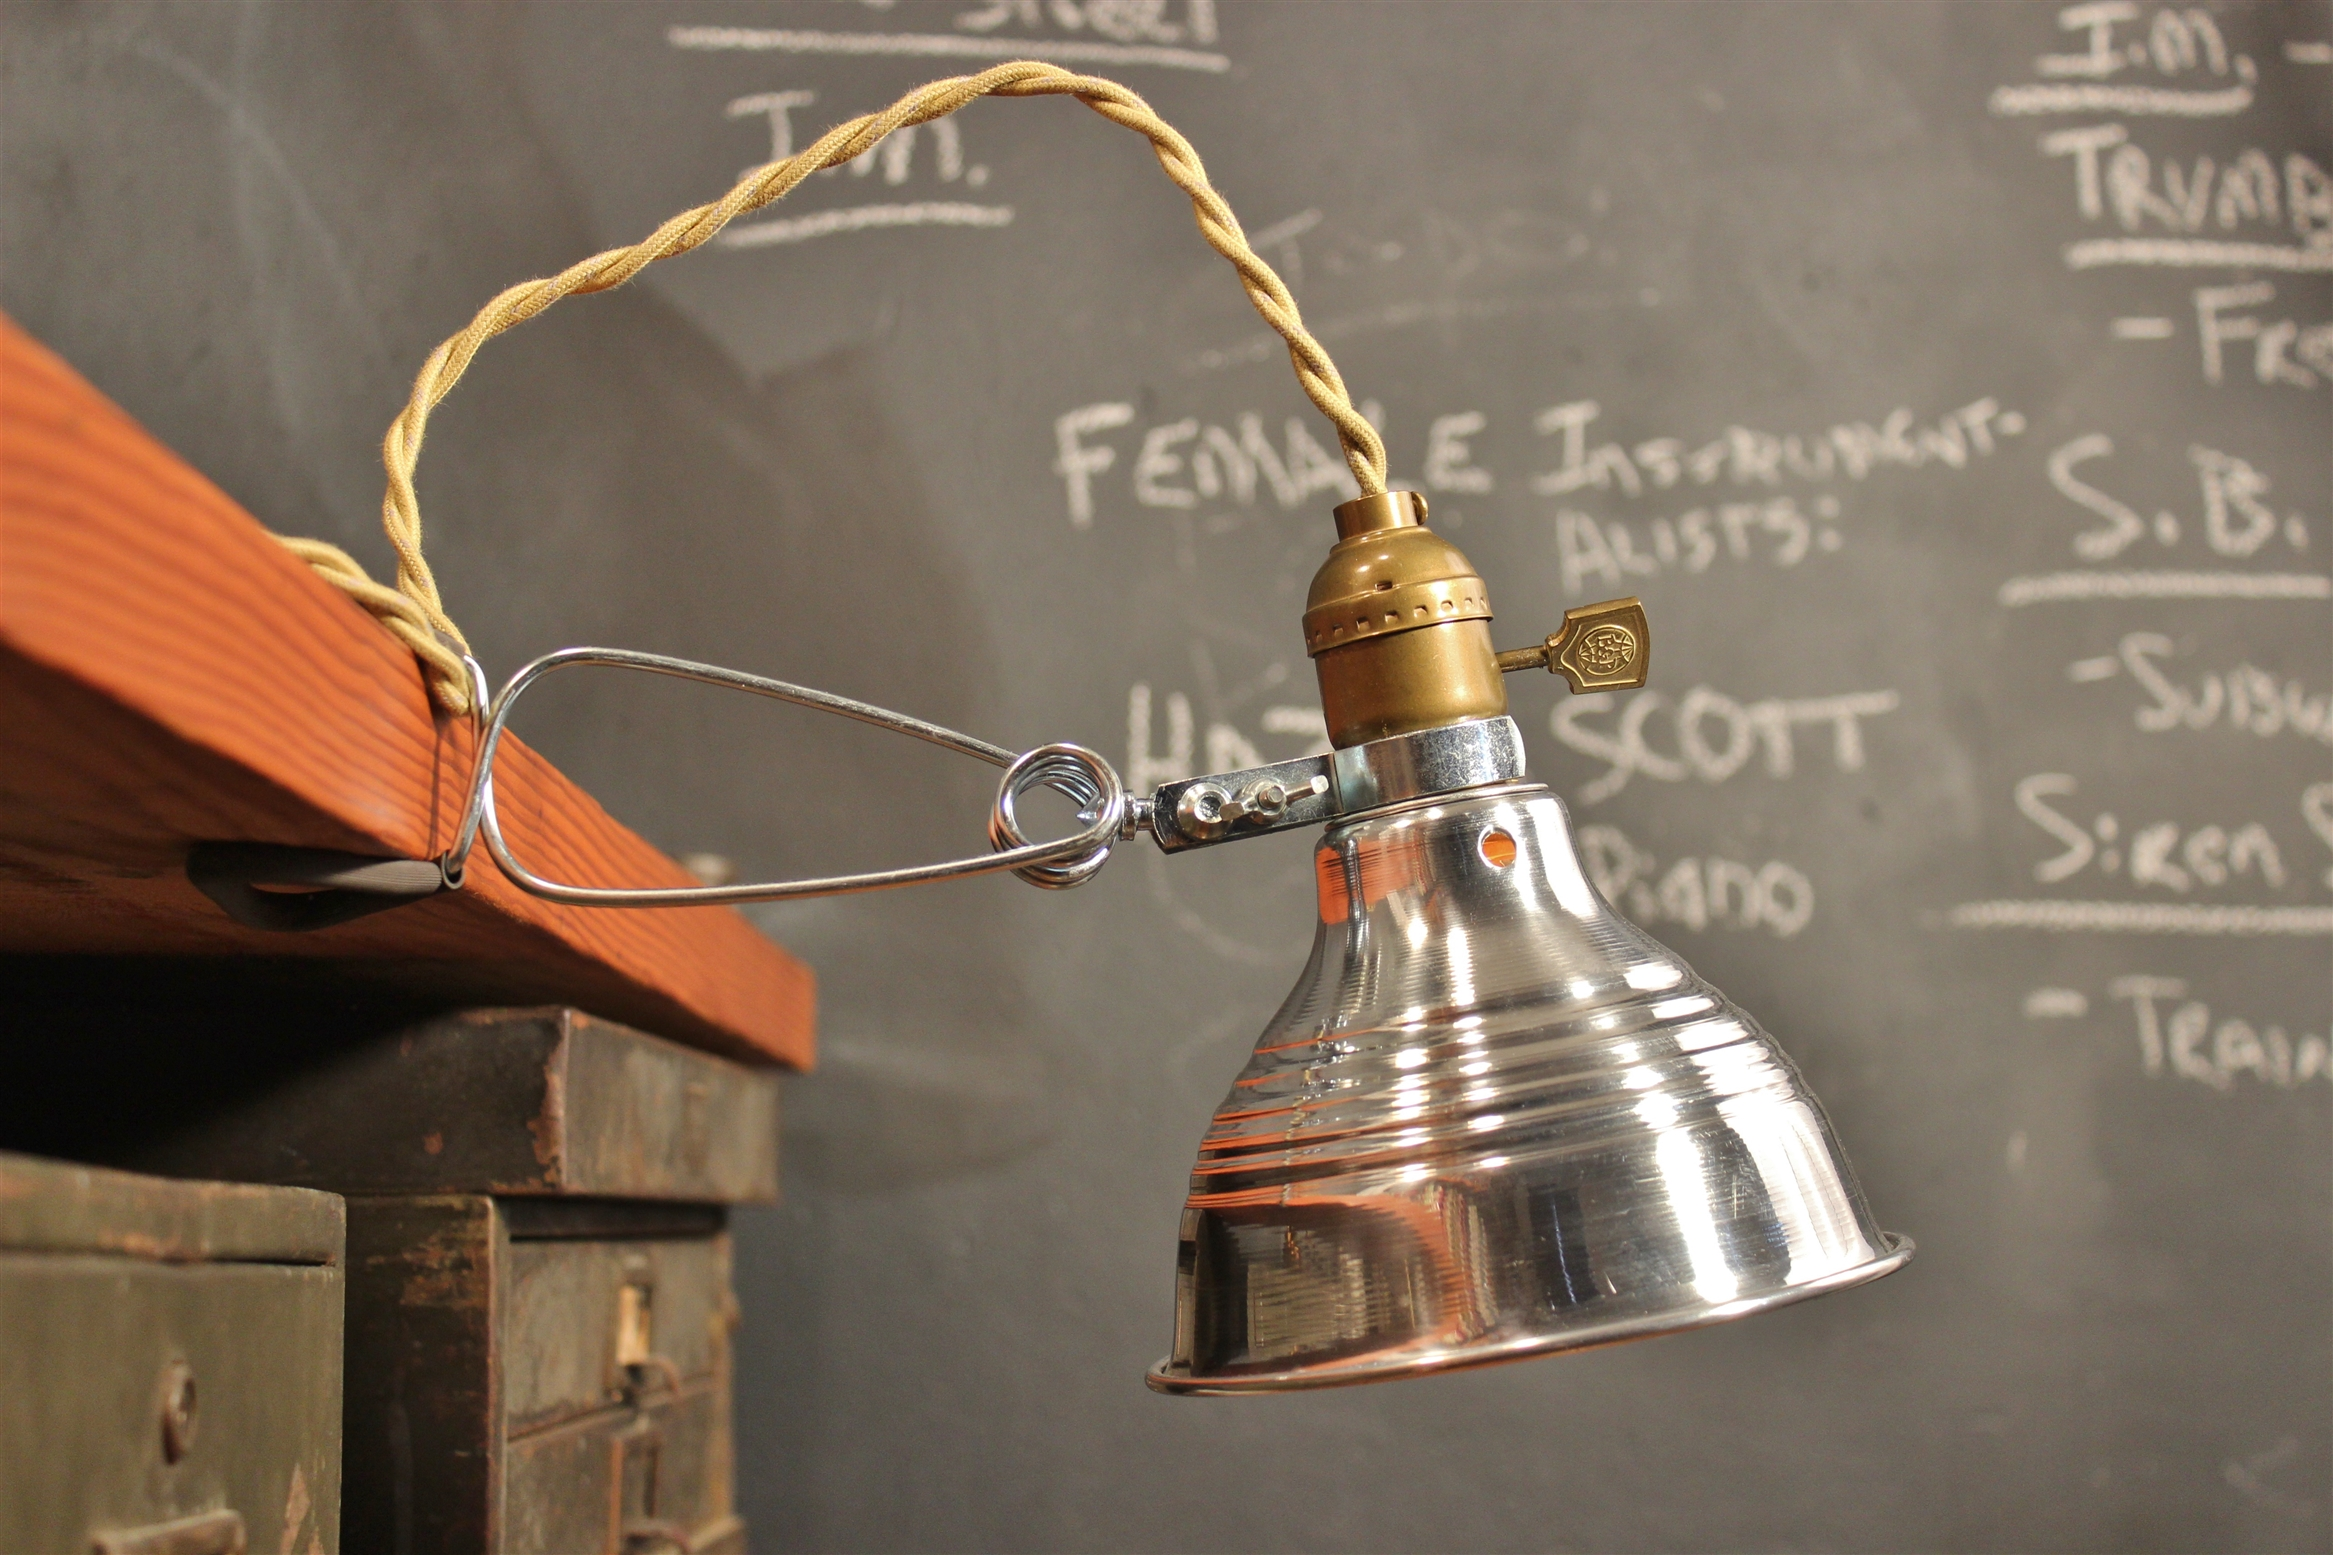 light com wall clamp off lamp amazon ikea ranarp spotlight lighting white dp